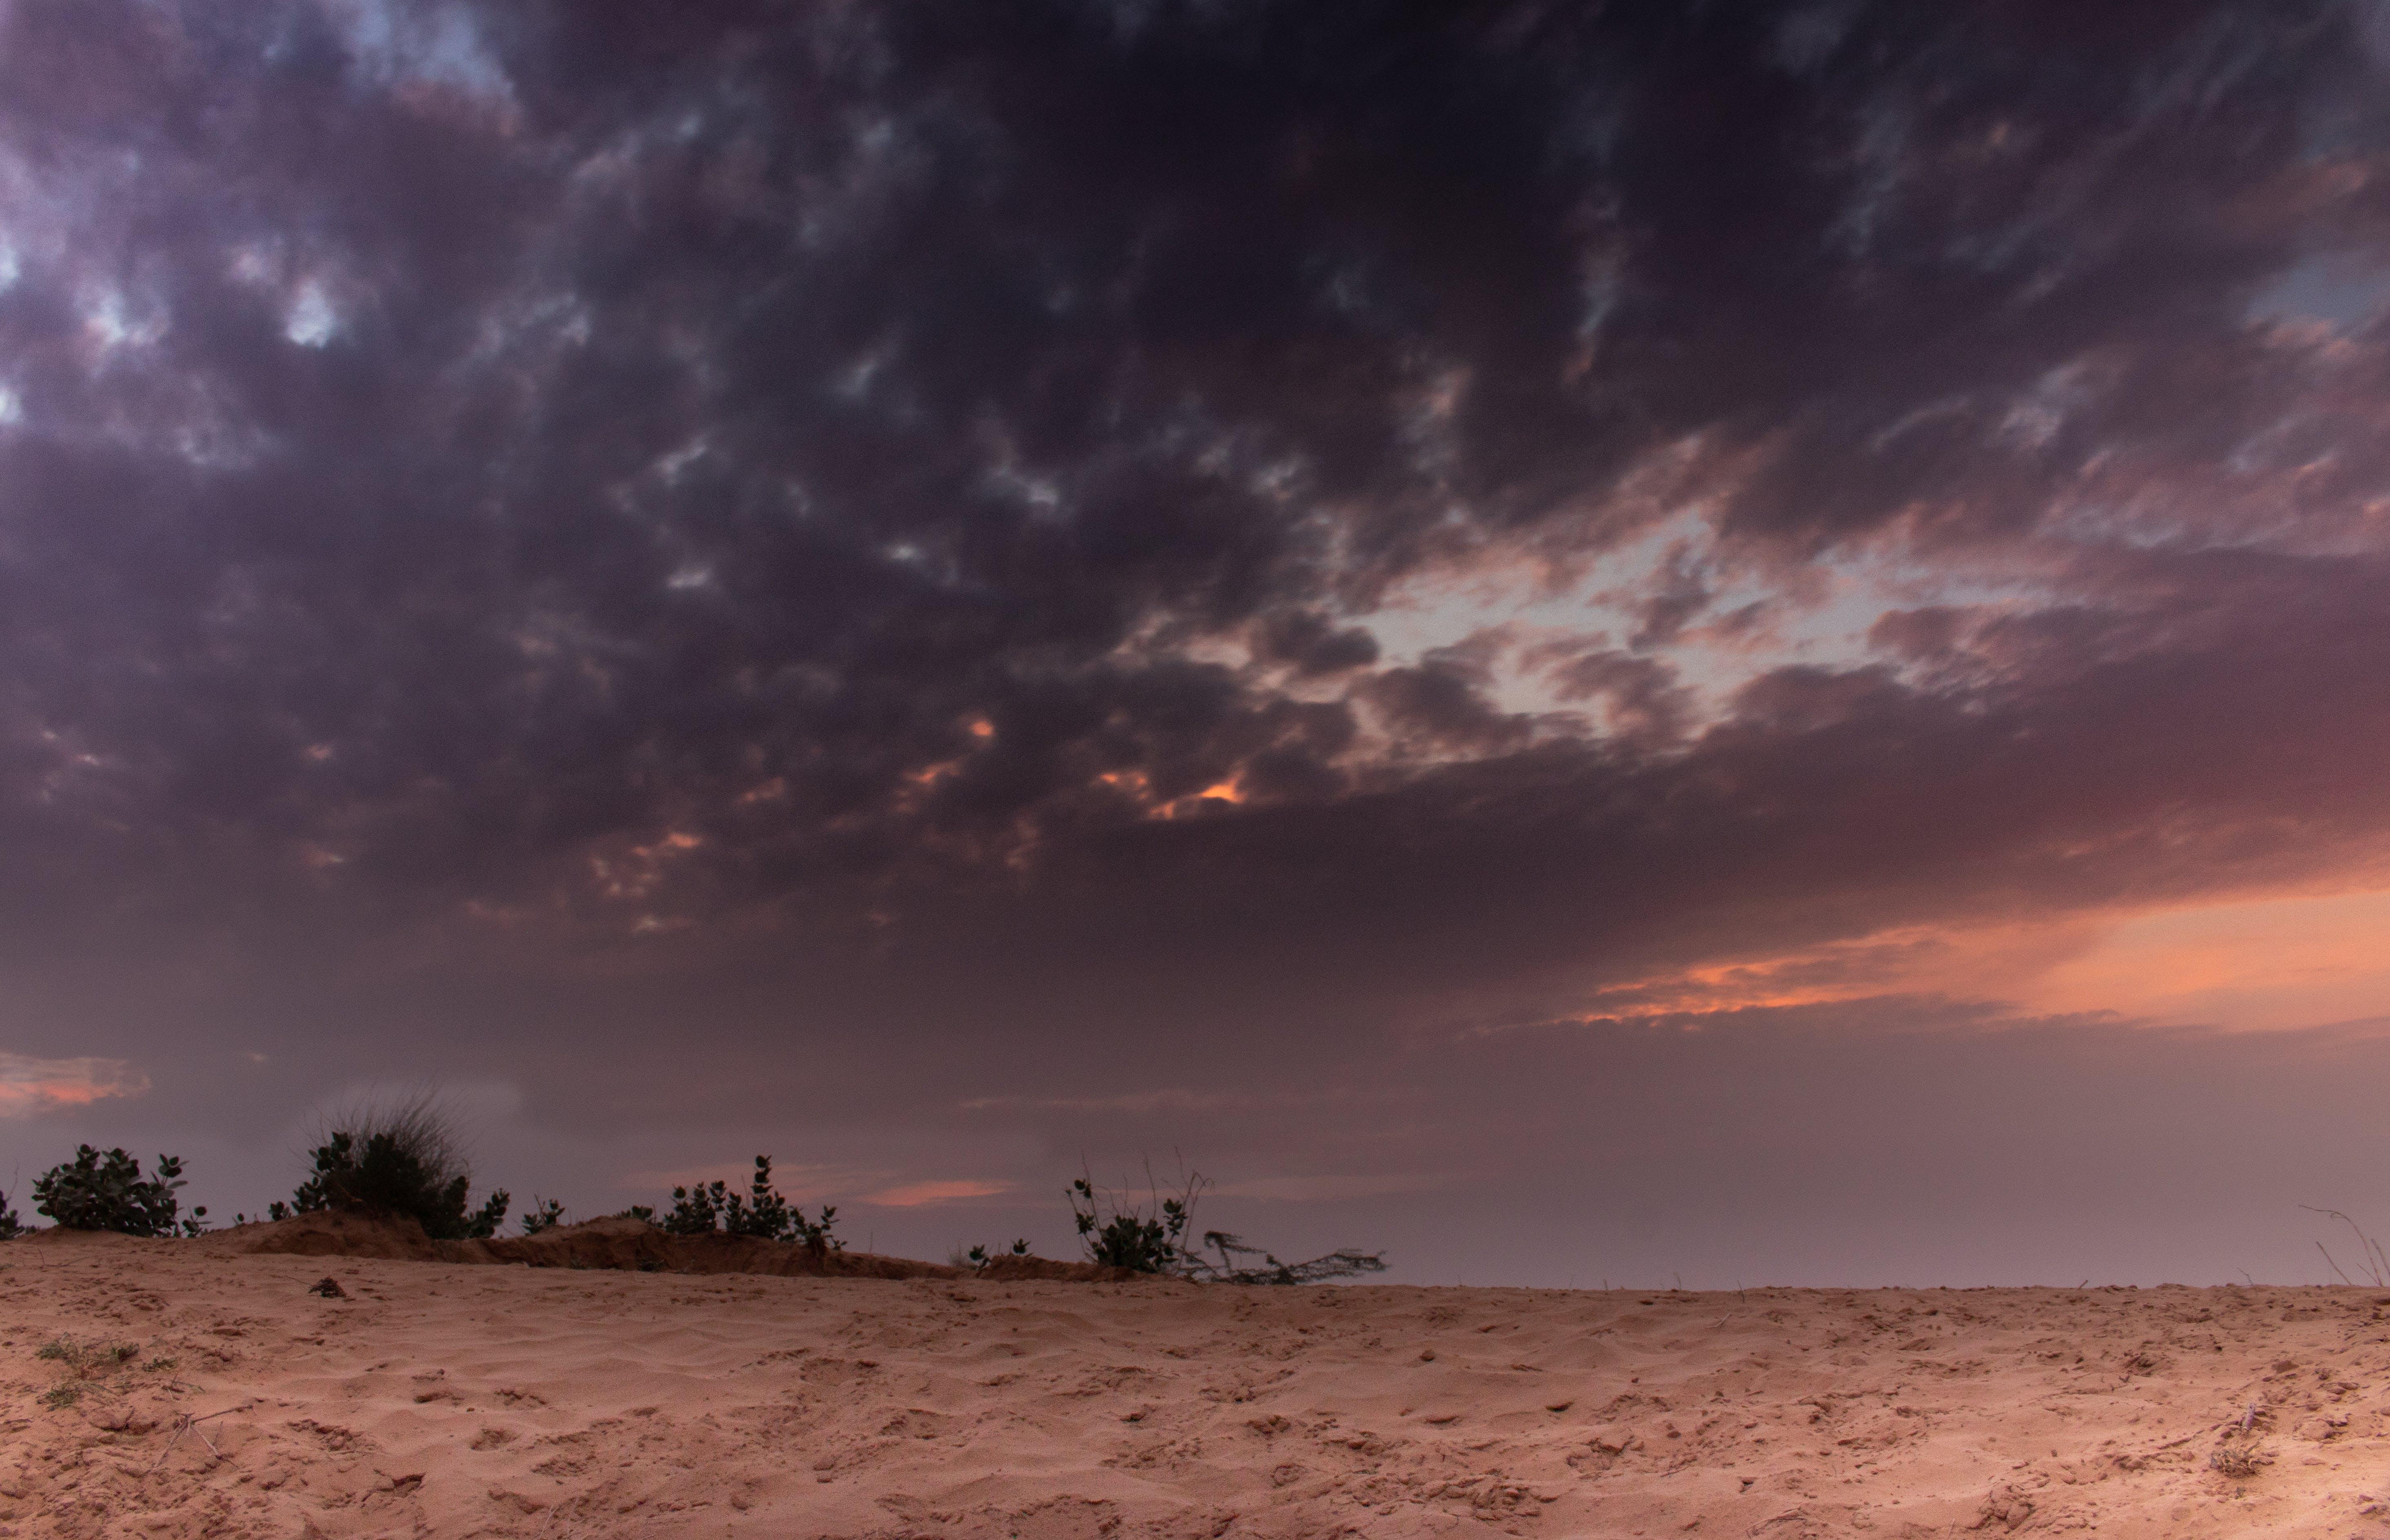 Sand Under Cloudy Skies